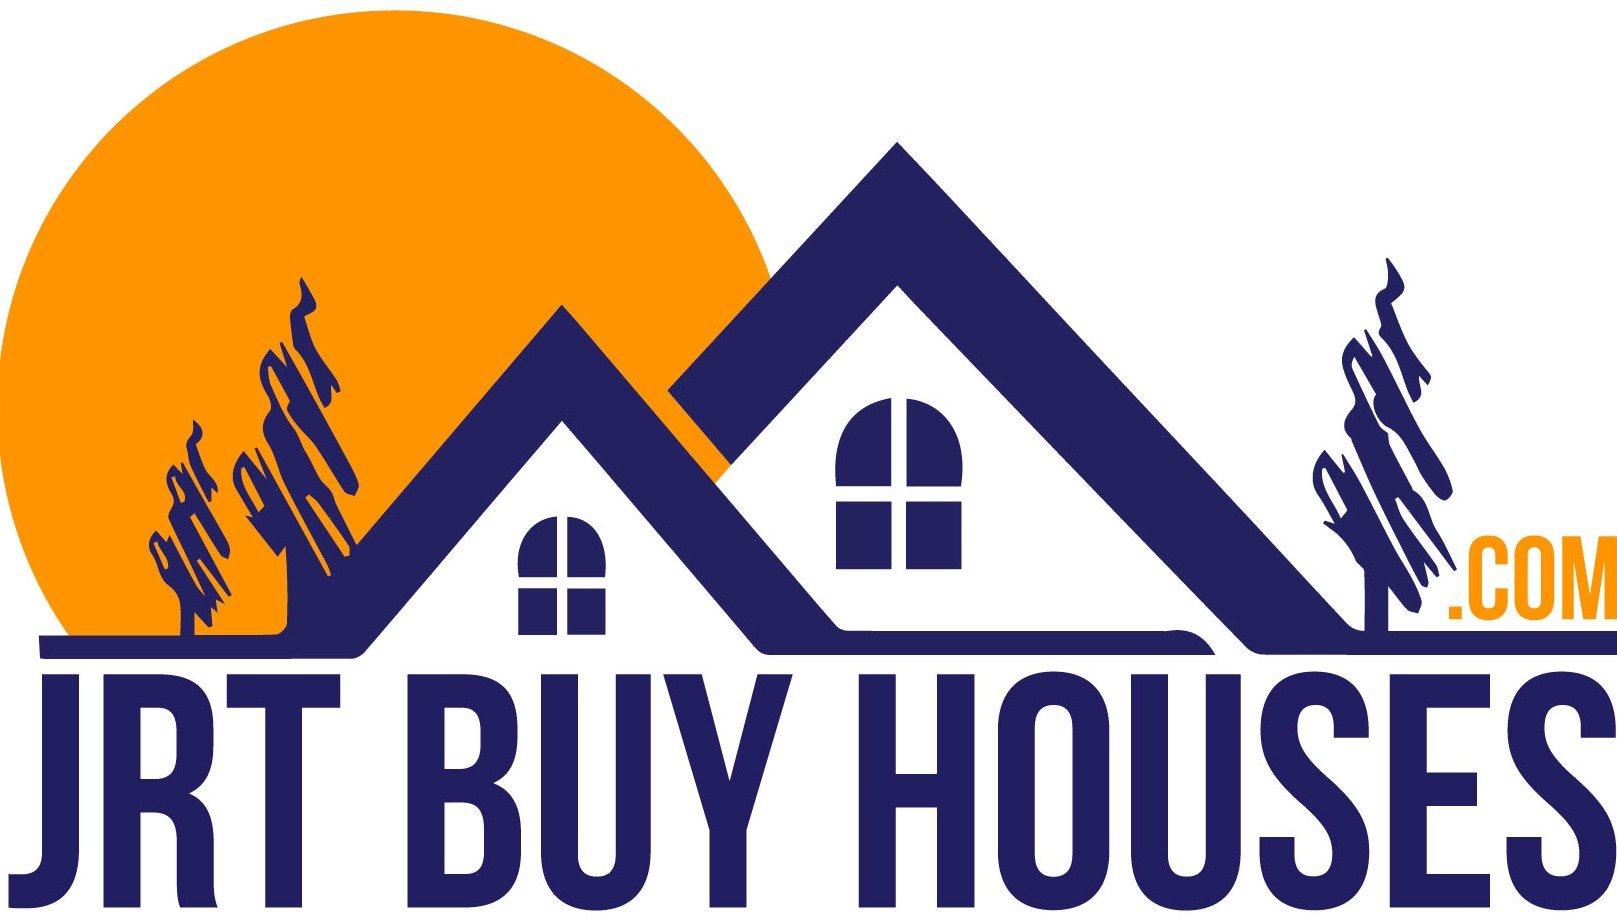 We Buy Houses South Florida logo